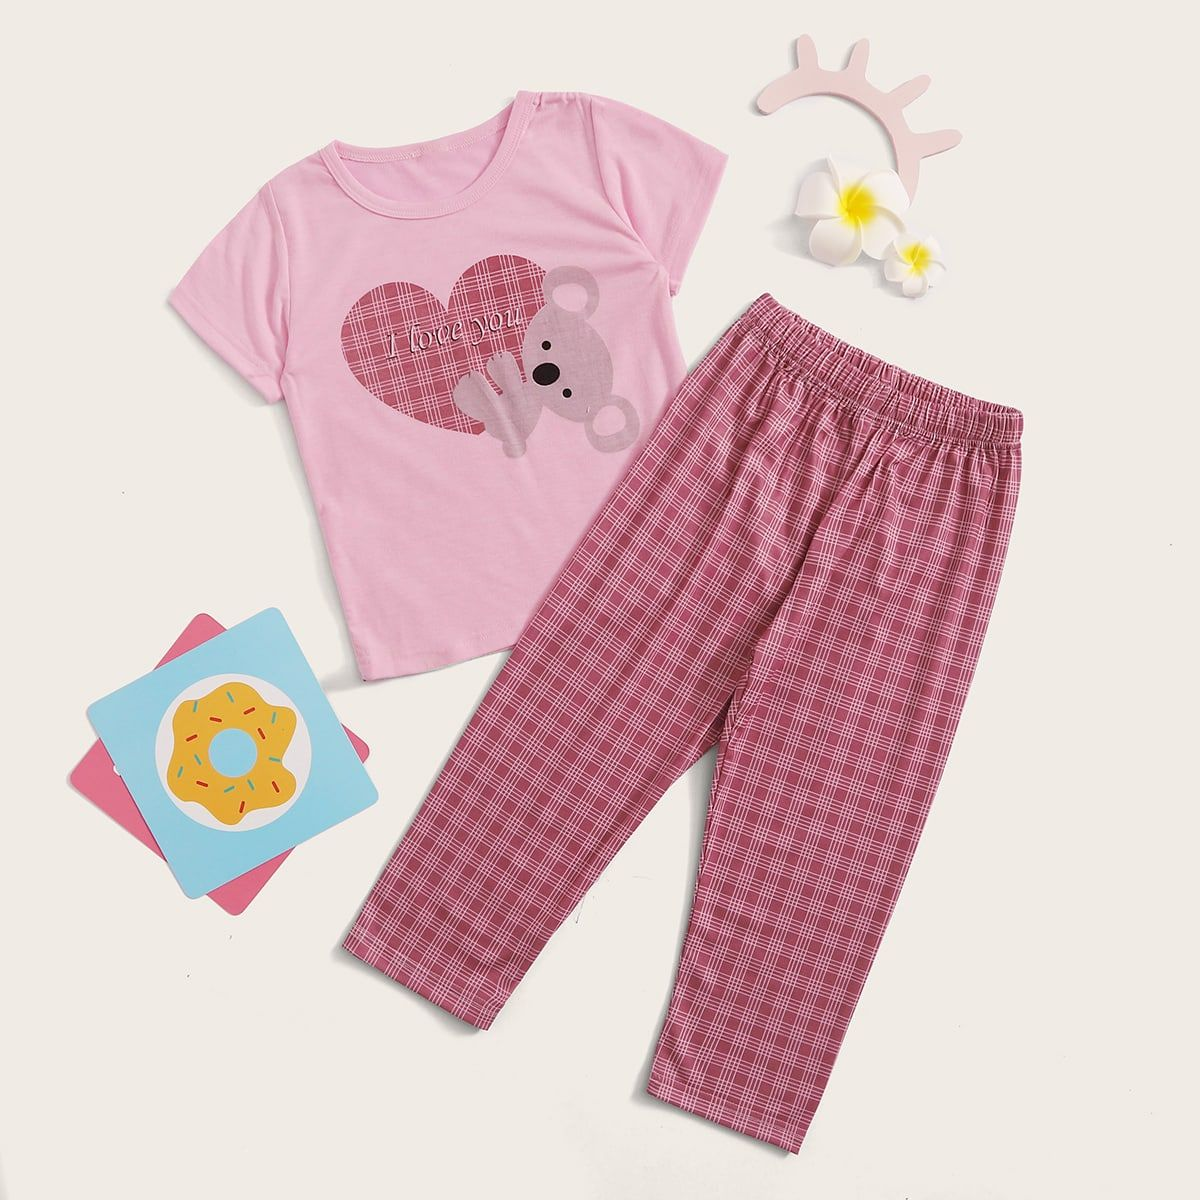 Toddler Girls Plaid amp Cartoon Graphic PJ Set Pink Casual Short Sleeve Rayon Plaid Cartoon Slight Stretch Toddler Girl Loungewear size features areBust Length Sleeve Len...